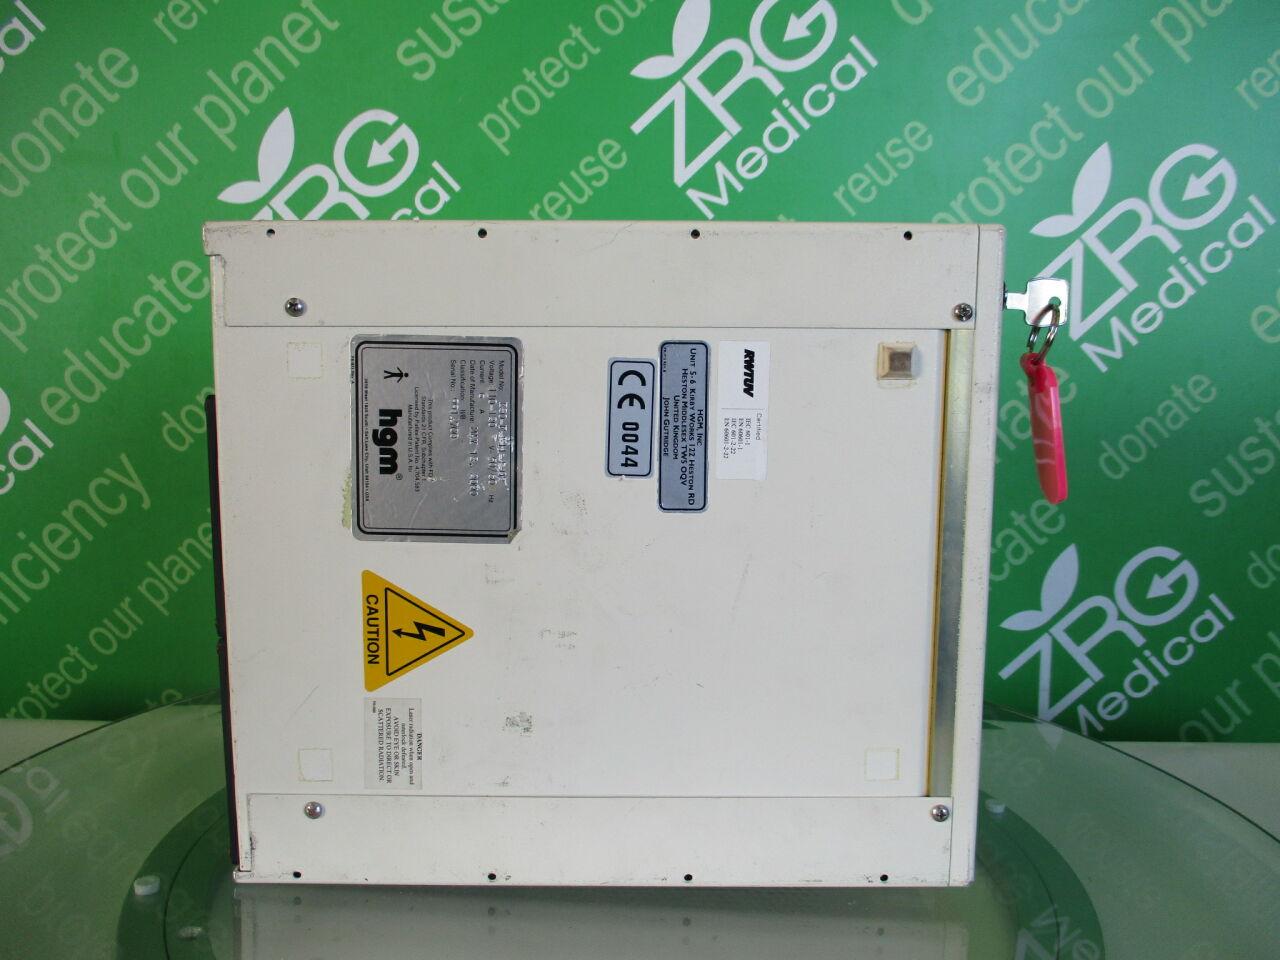 HGM ELITE 532  Ophthalmic Laser